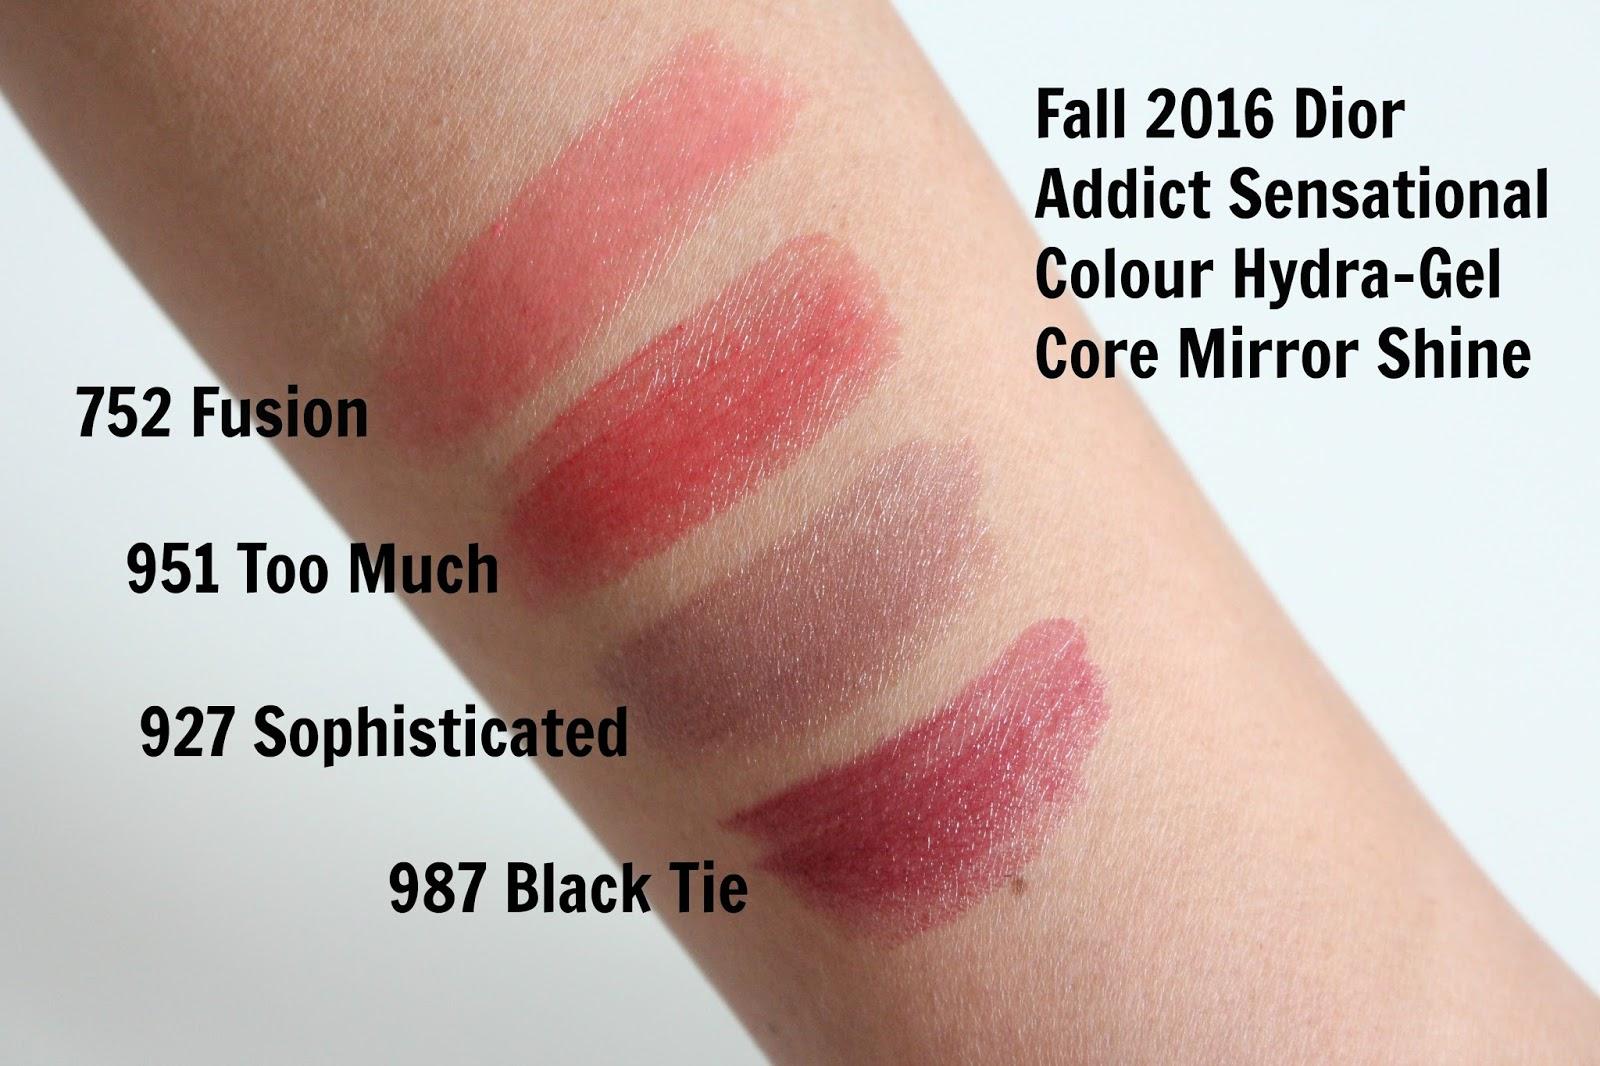 Addict Lipstick Hydra-Gel Core Mirror Shine by Dior #7